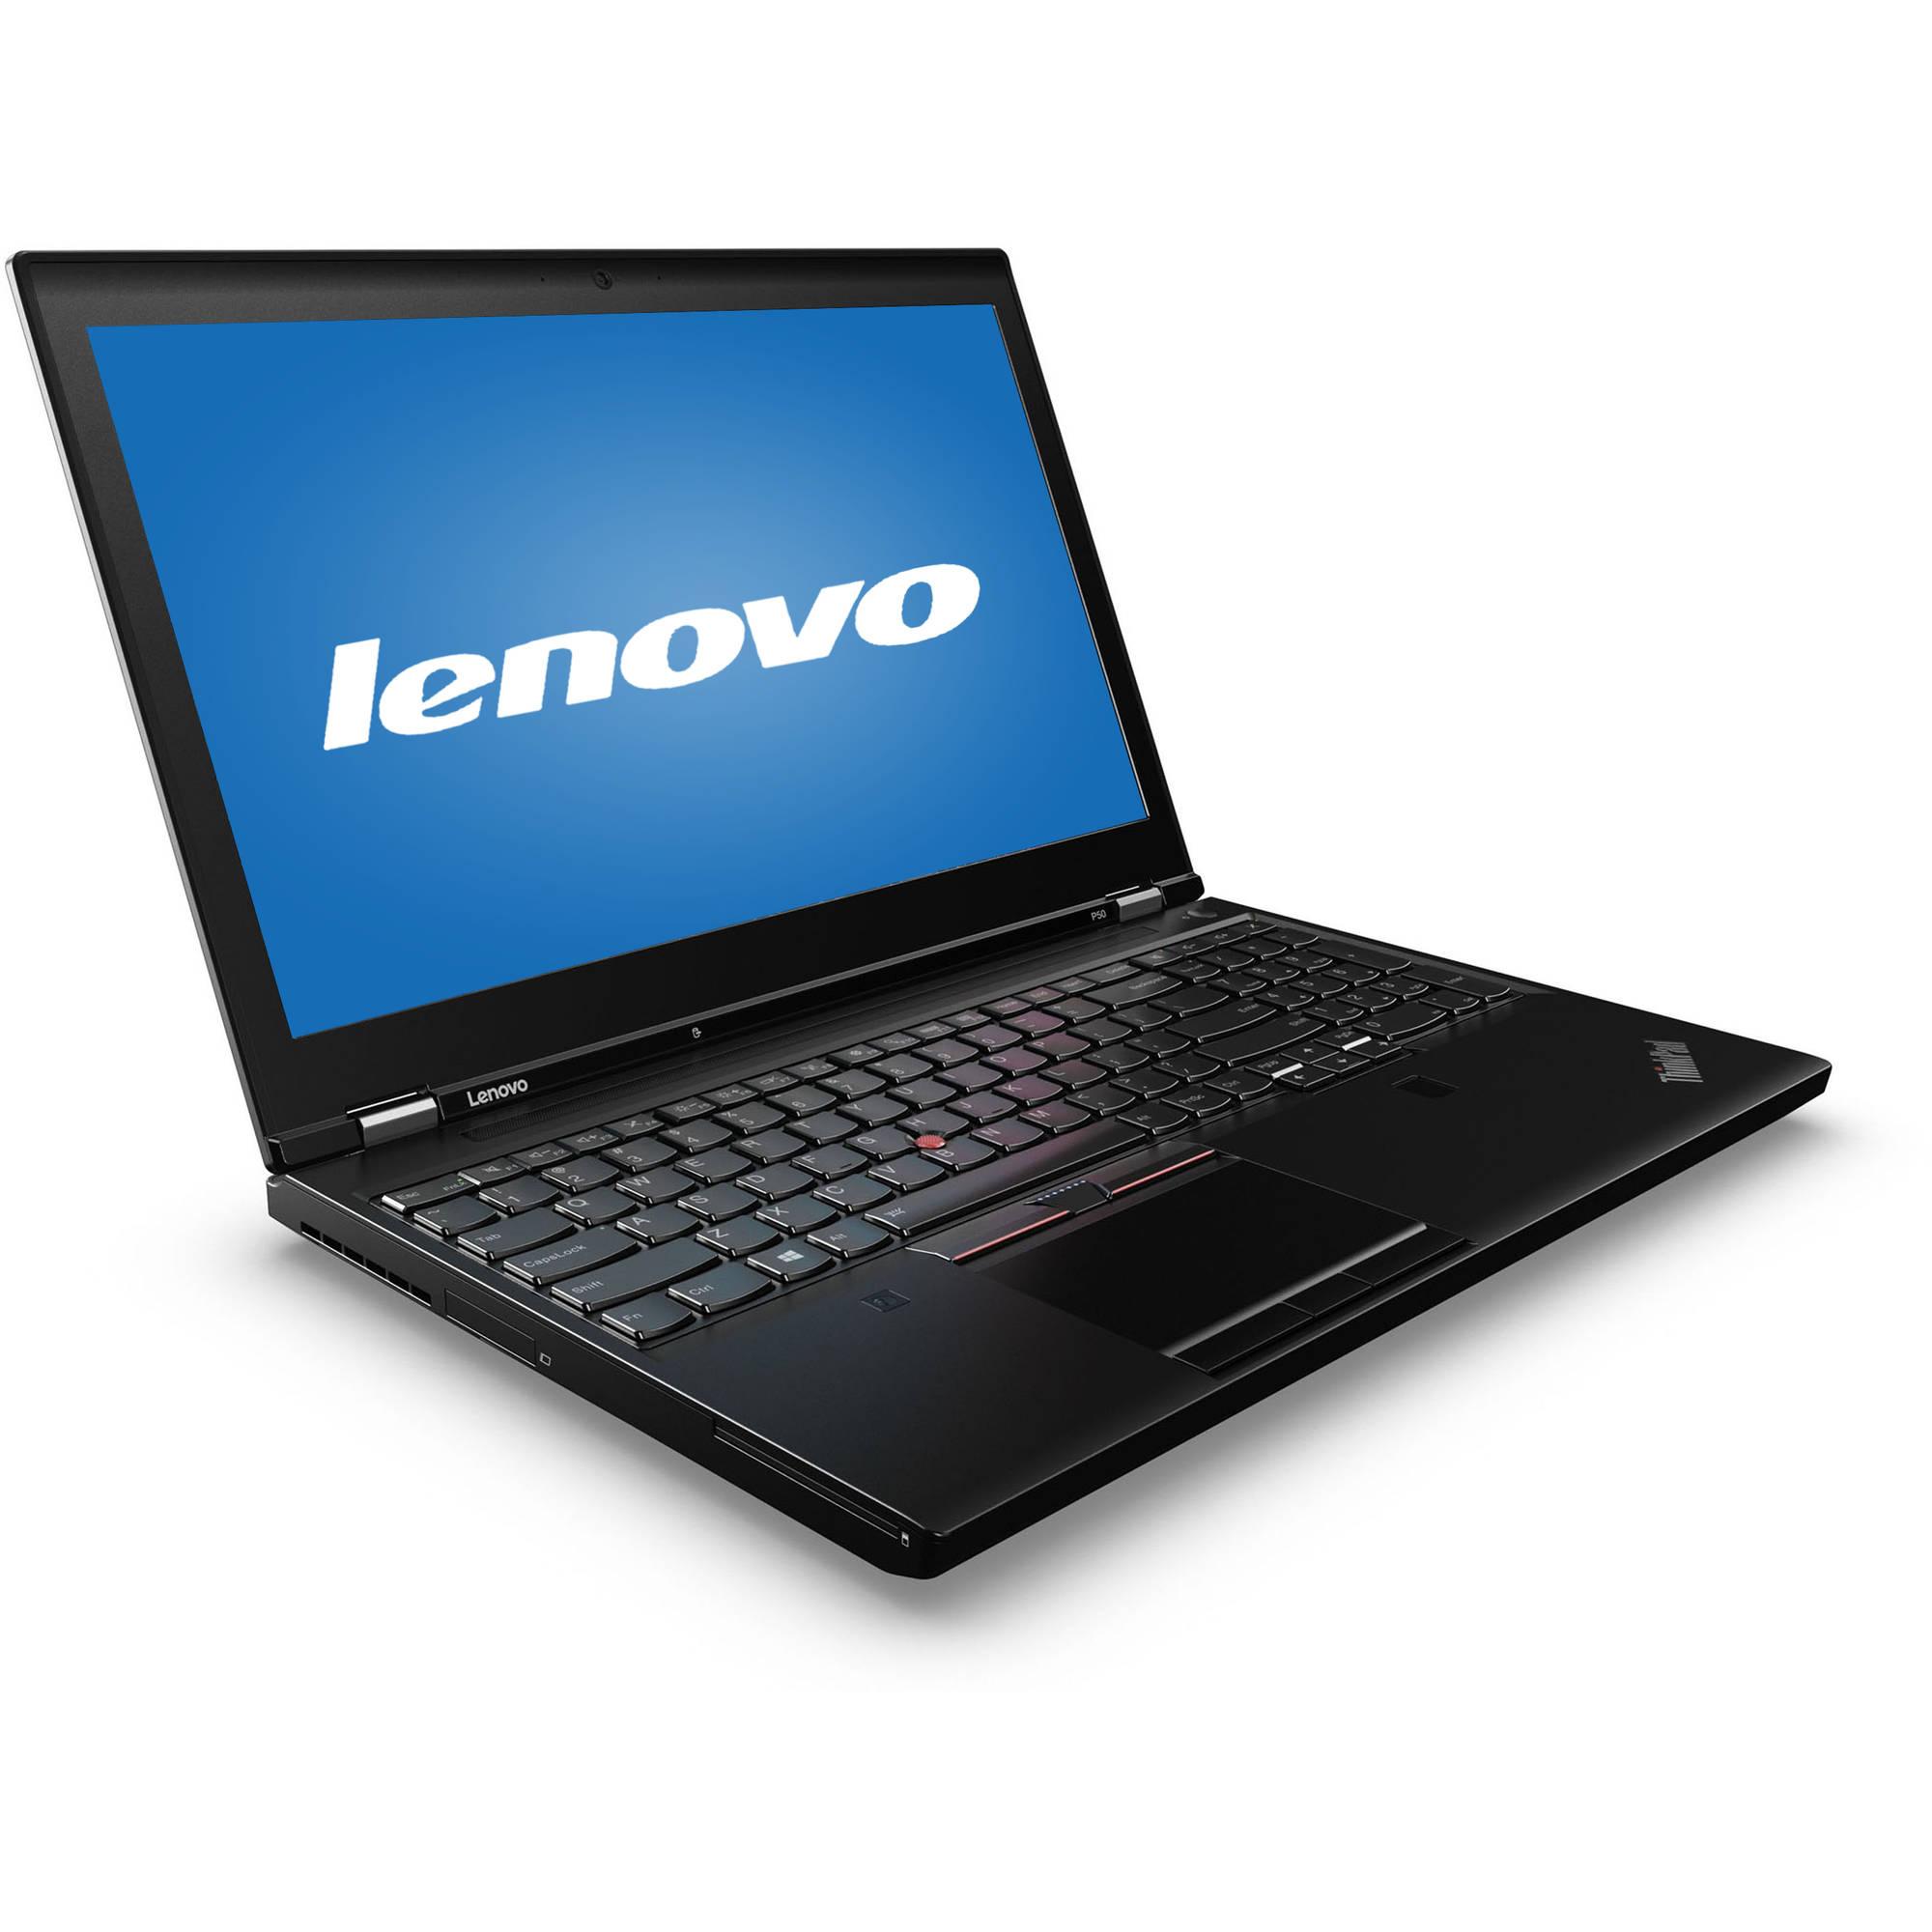 "lenovo black 15.6"" thinkpad p50 20en0013us laptop pc with"